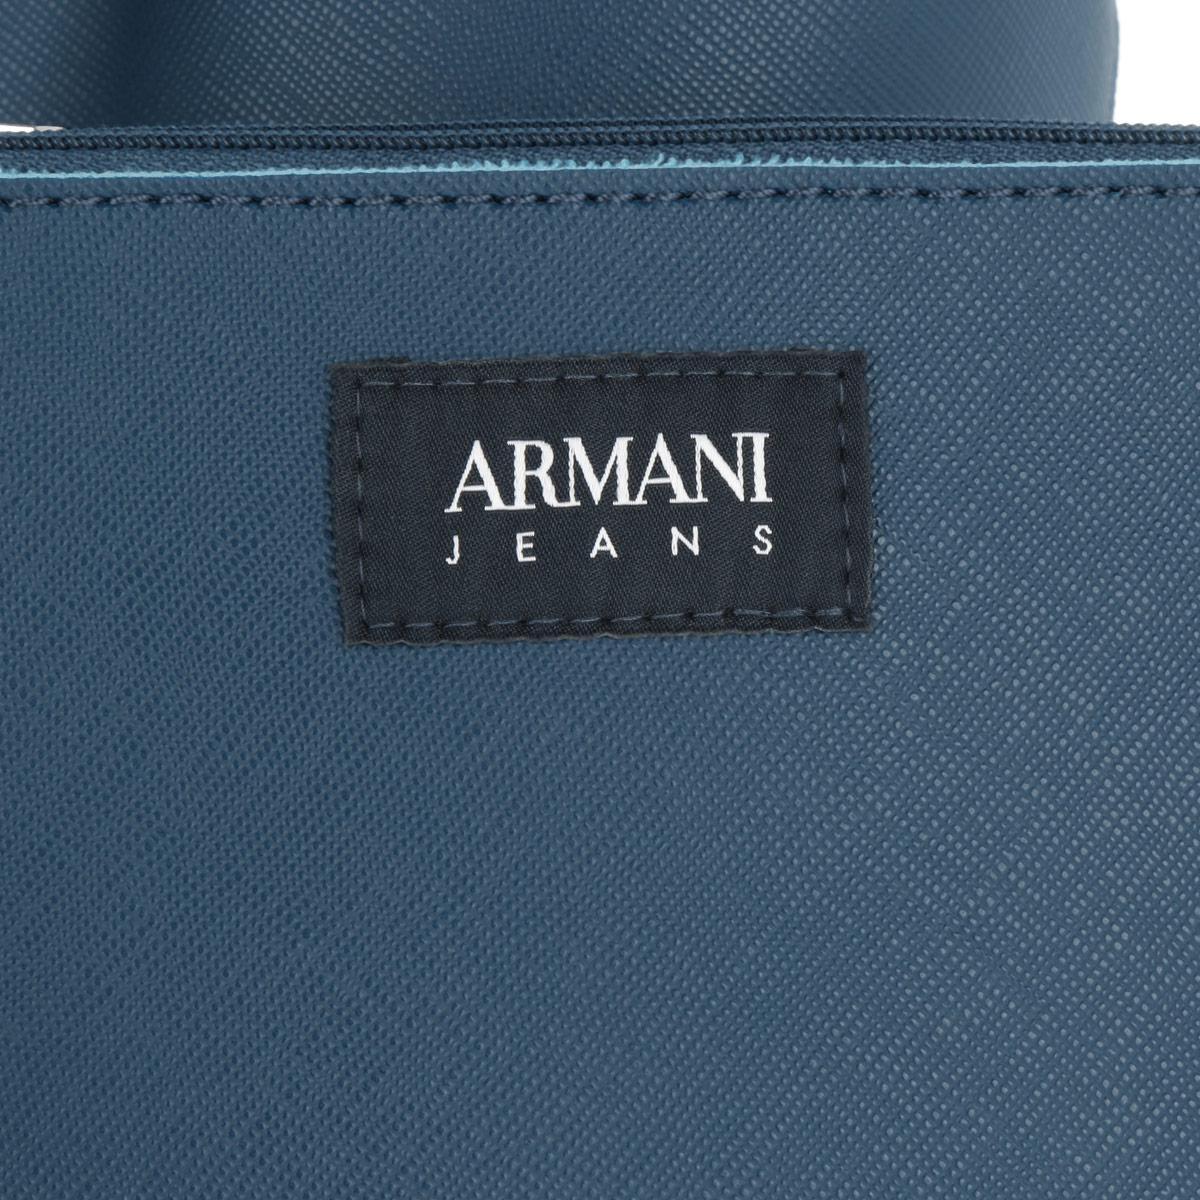 4c42a83de1b Armani Jeans Eco-saffiano Leather Shopping Bag Ocean Blue in Blue - Lyst